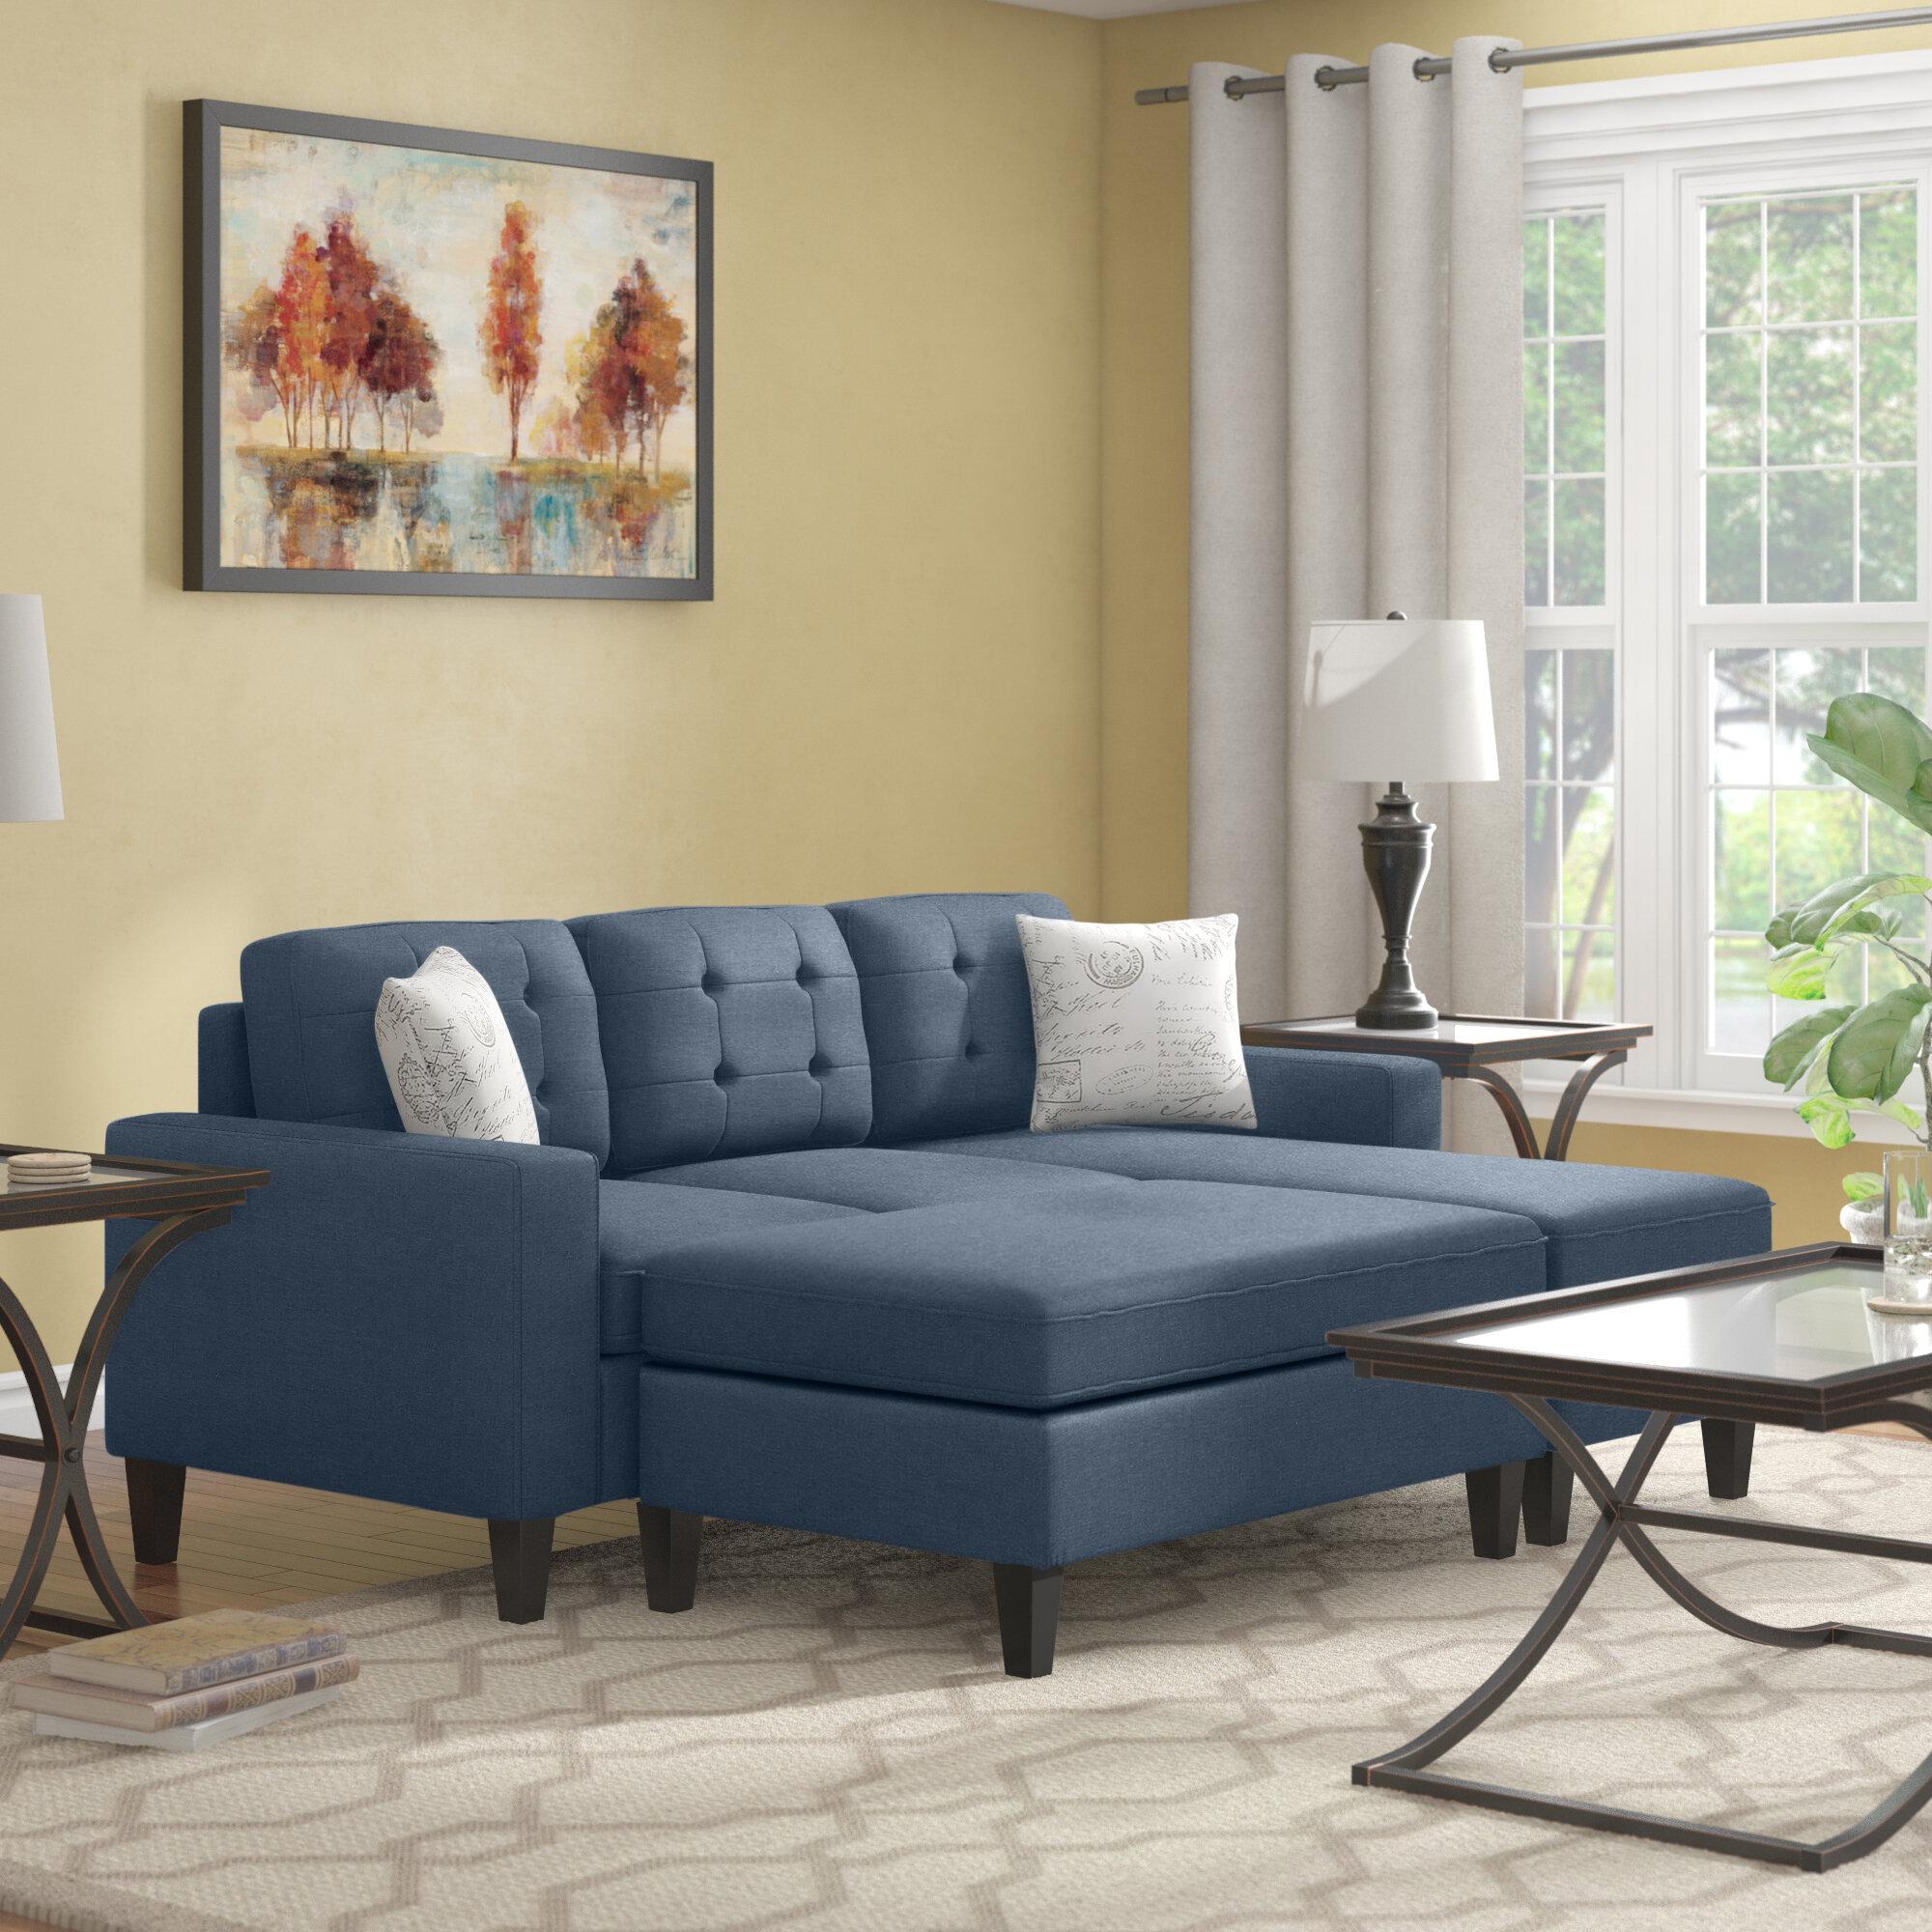 Ebern Designs Ellensburg 81 Reversible Sleeper Sectional With Ottoman Reviews Wayfair